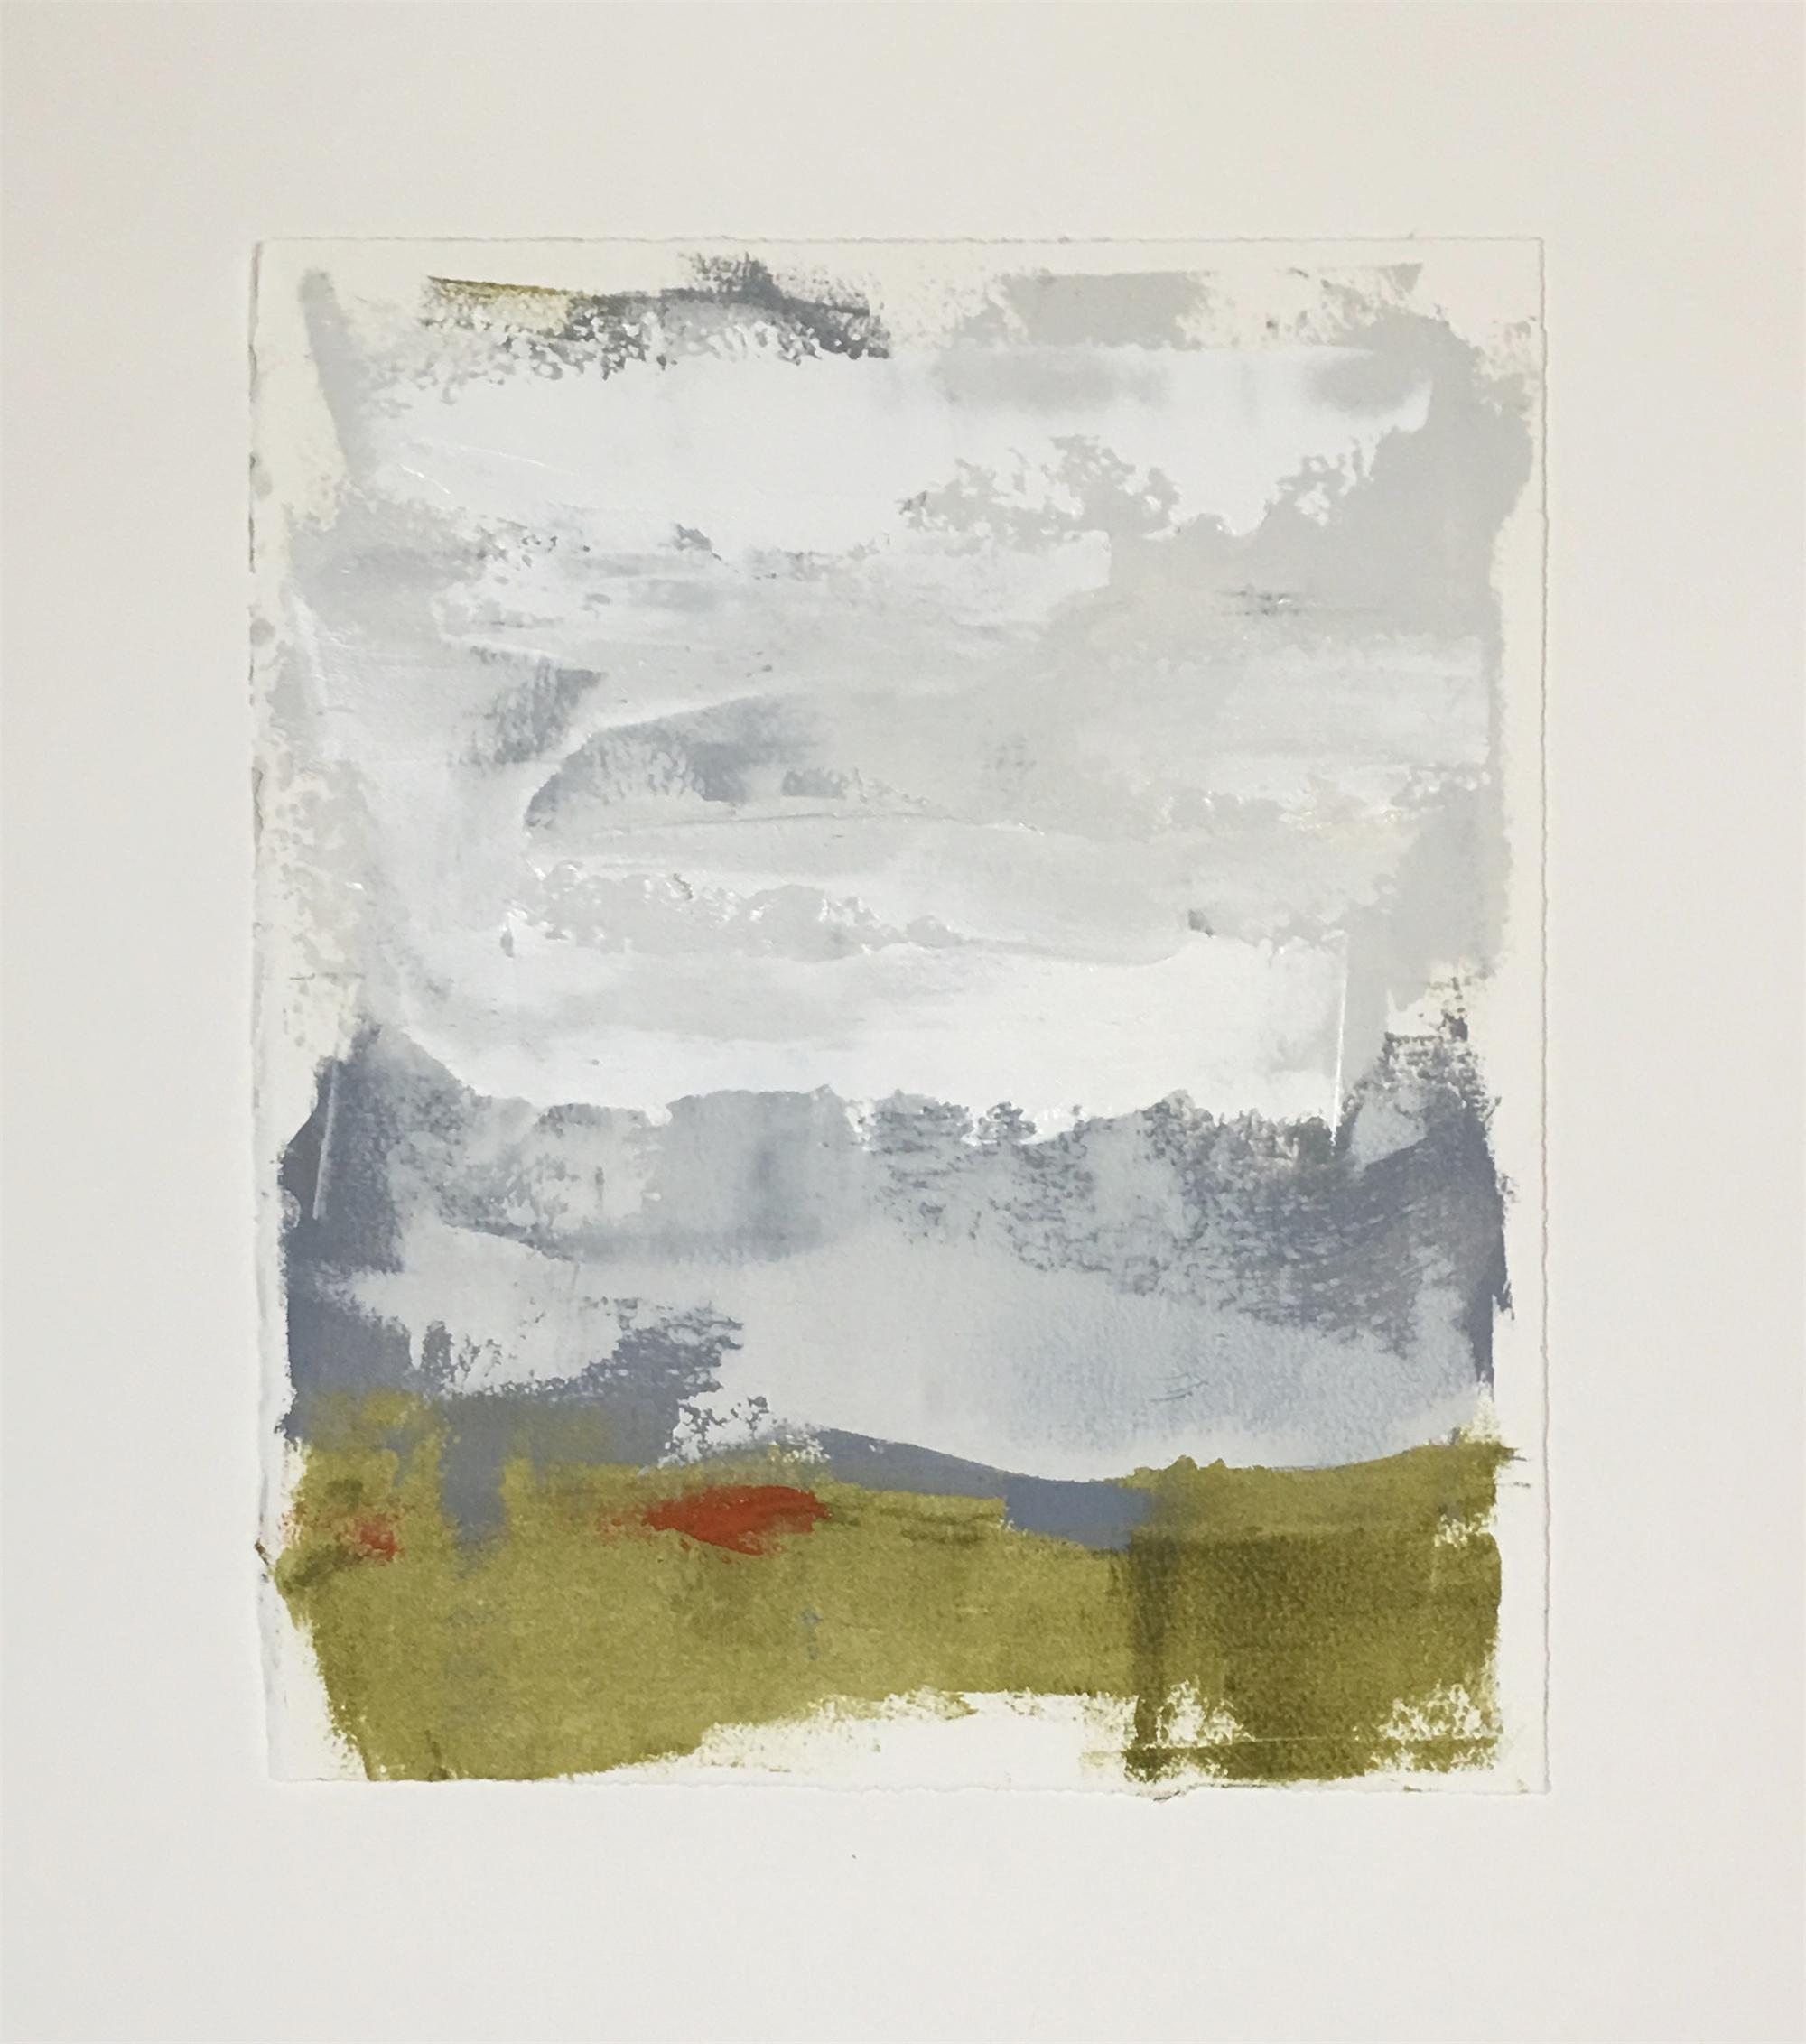 Untitled (Landscape II) by Lynn Johnson